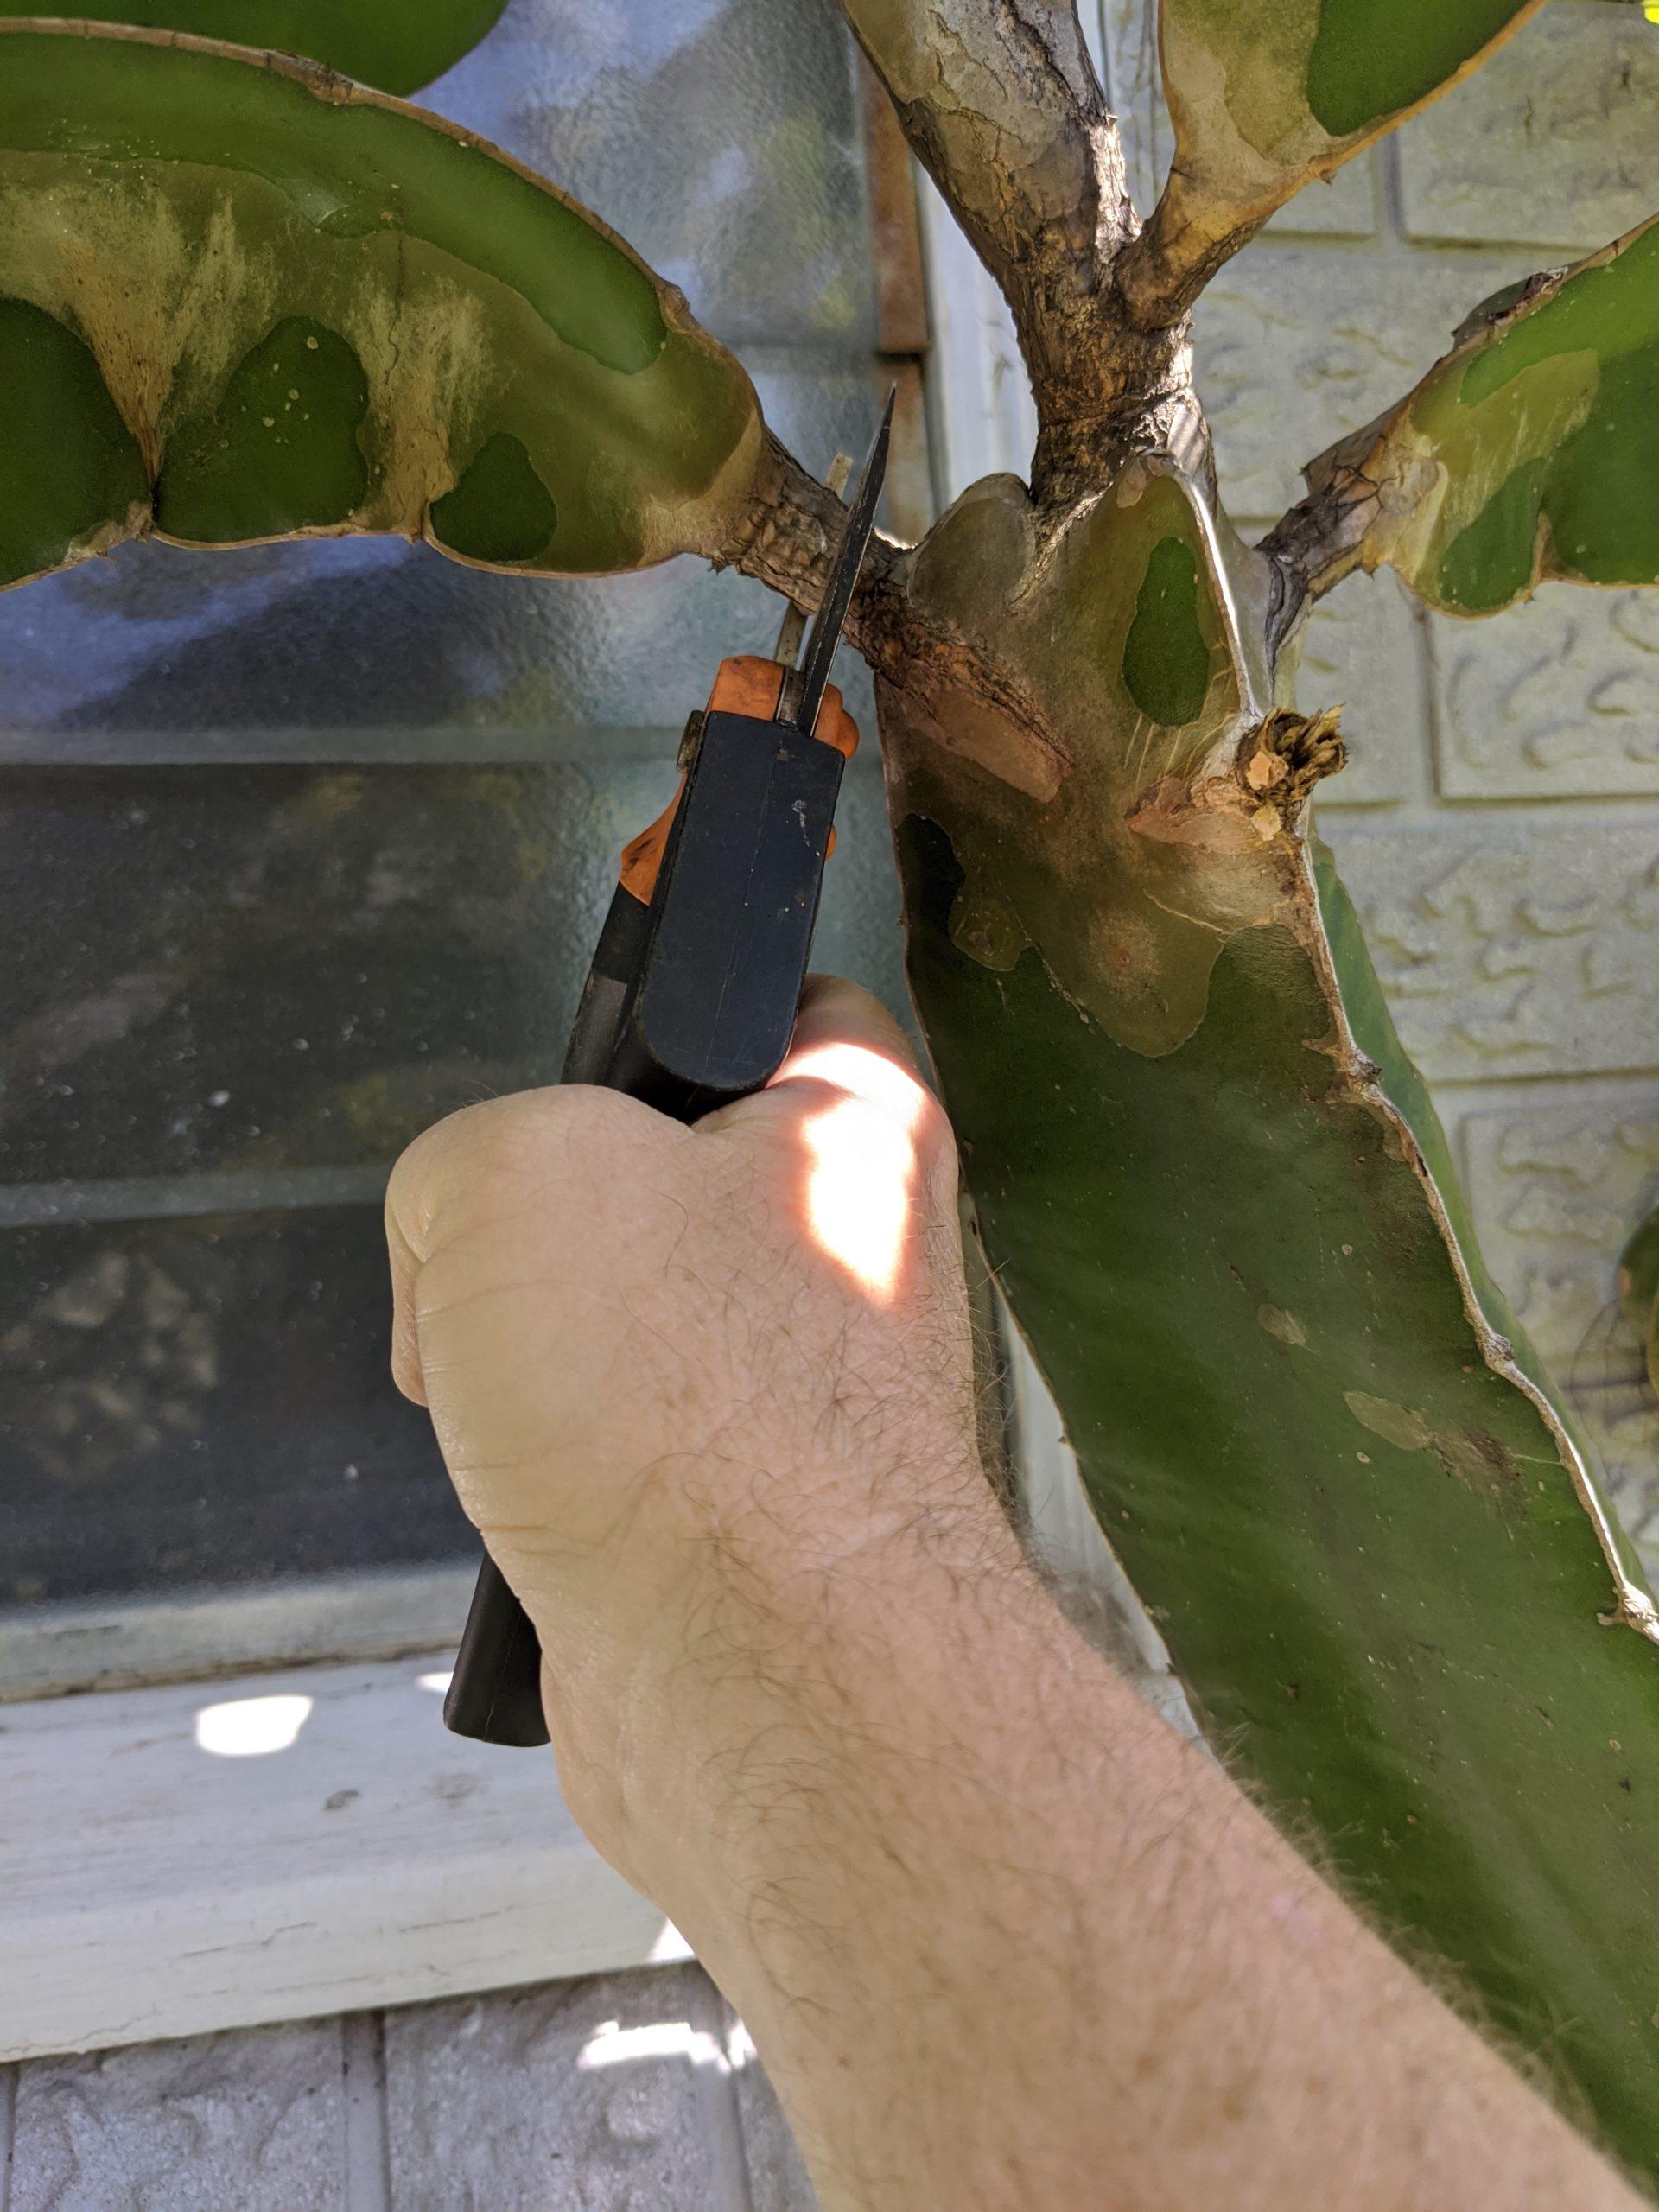 Secateurs vs Cactus